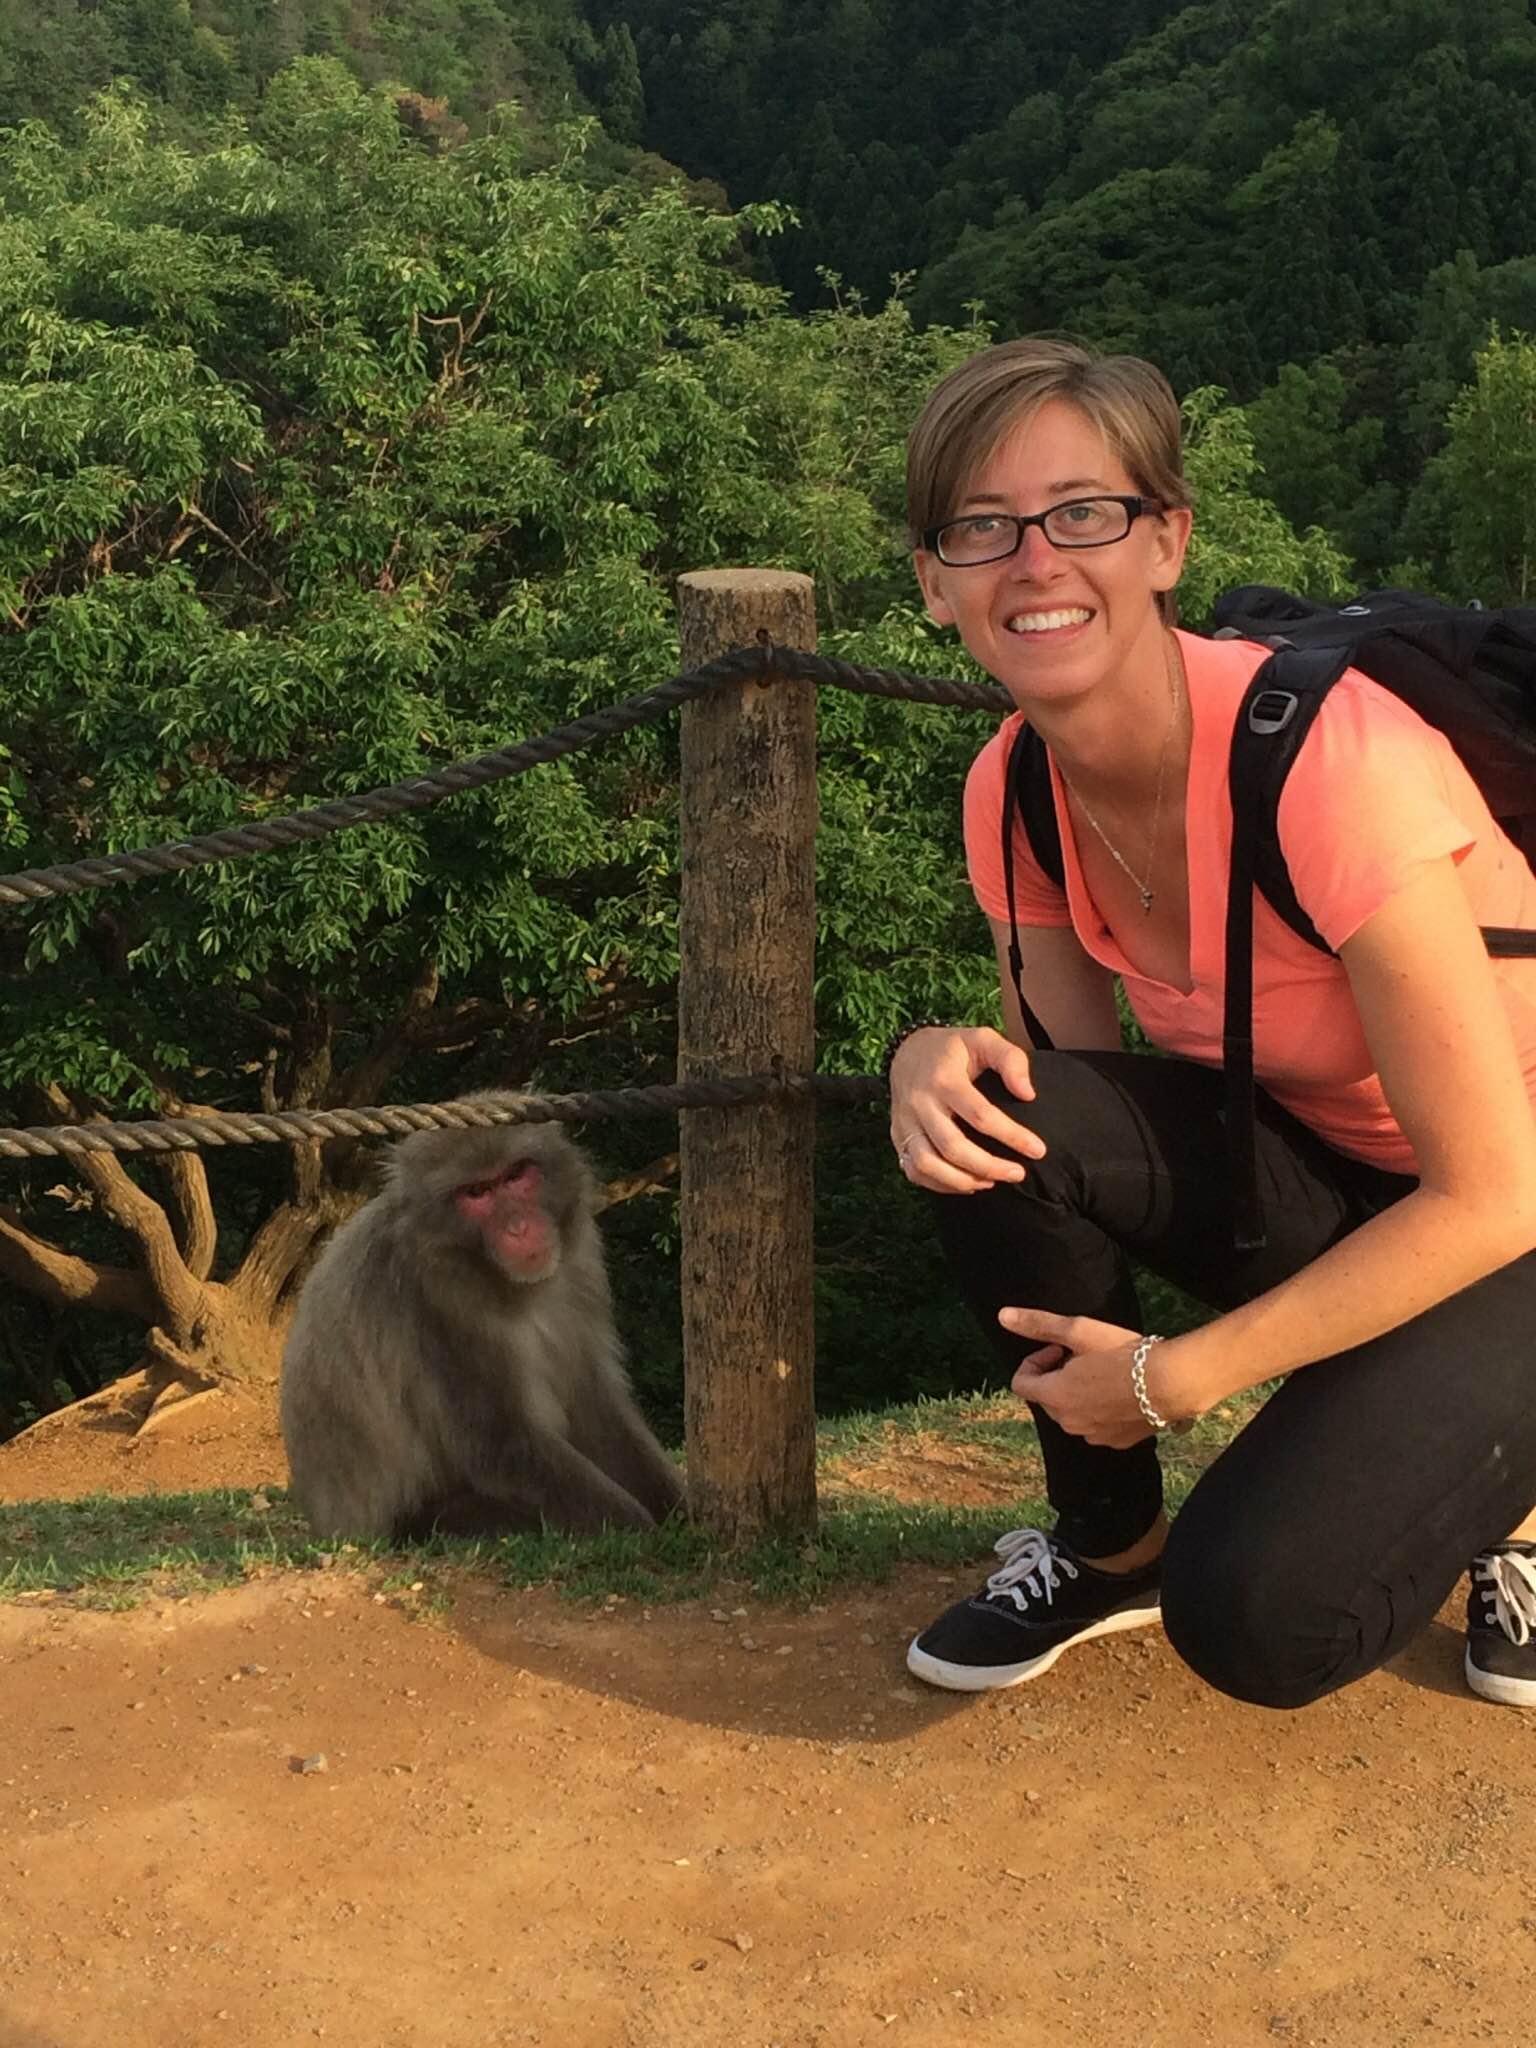 monkeypark